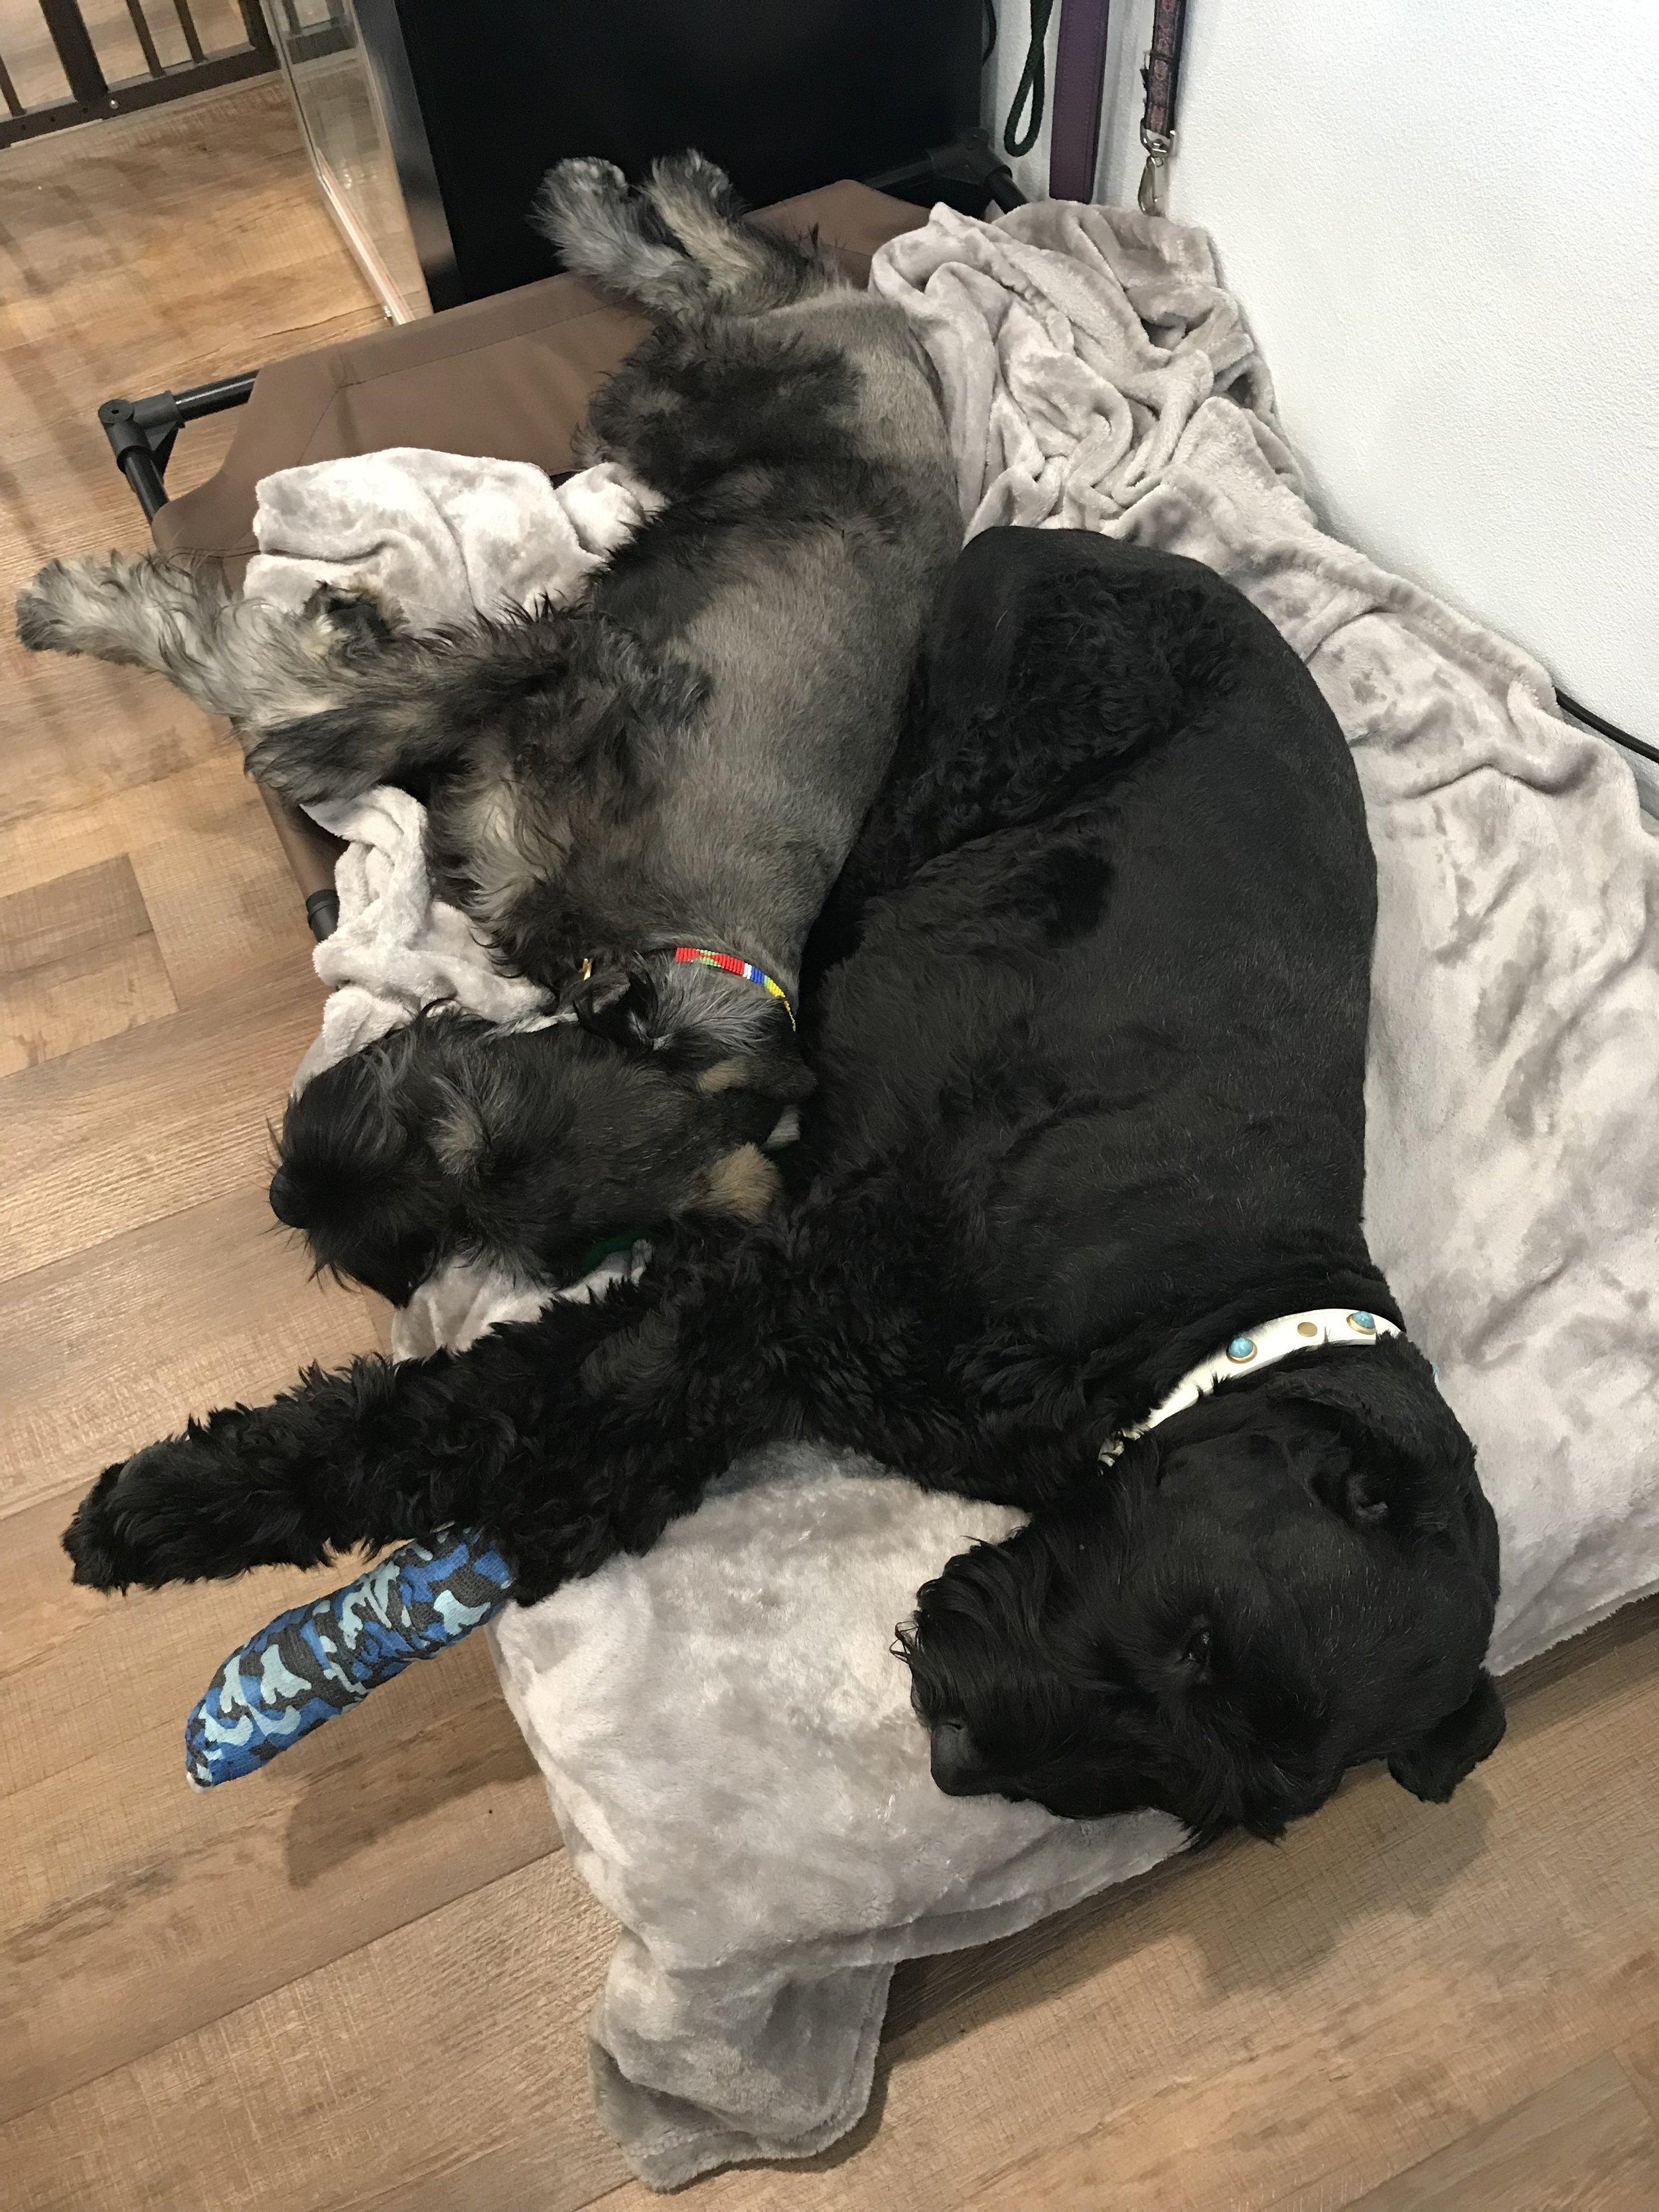 Sophie tolerated Archie's invasive snuggles